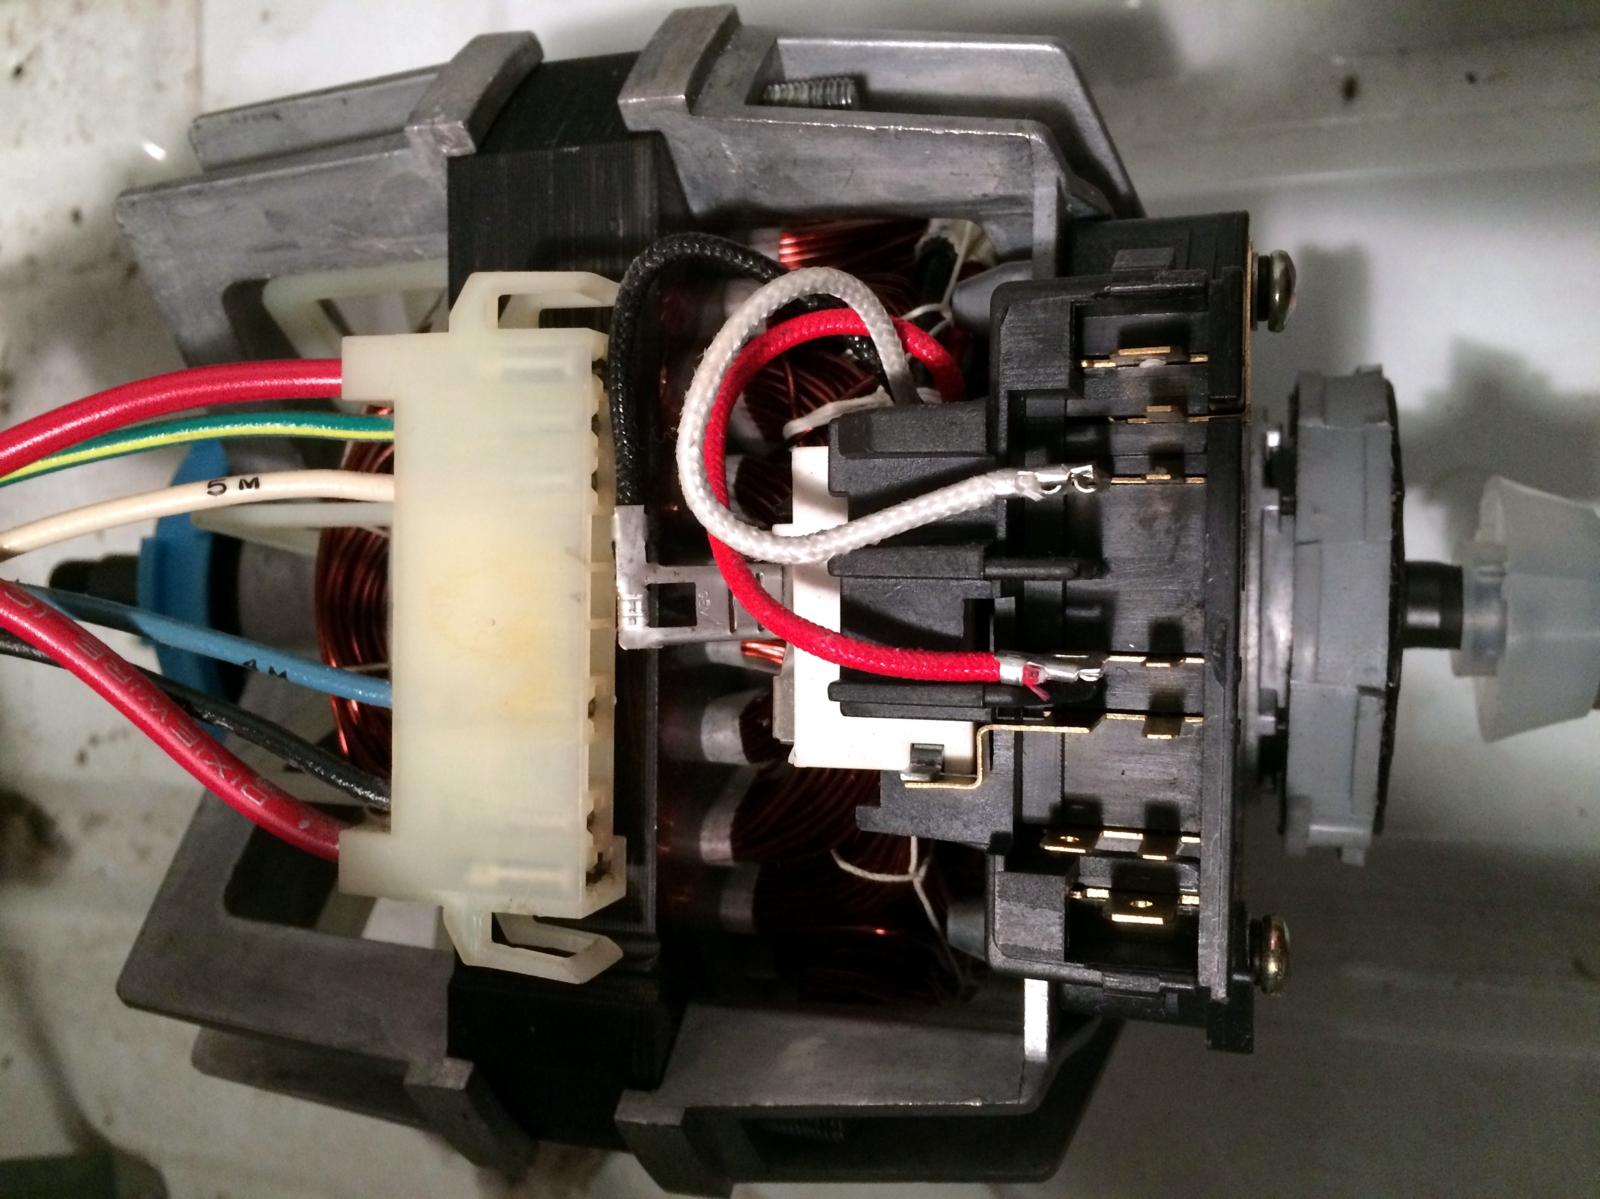 whirlpool dryer heating element wiring diagram annavernon fixed whirlpool dryer won t start but inner light does work